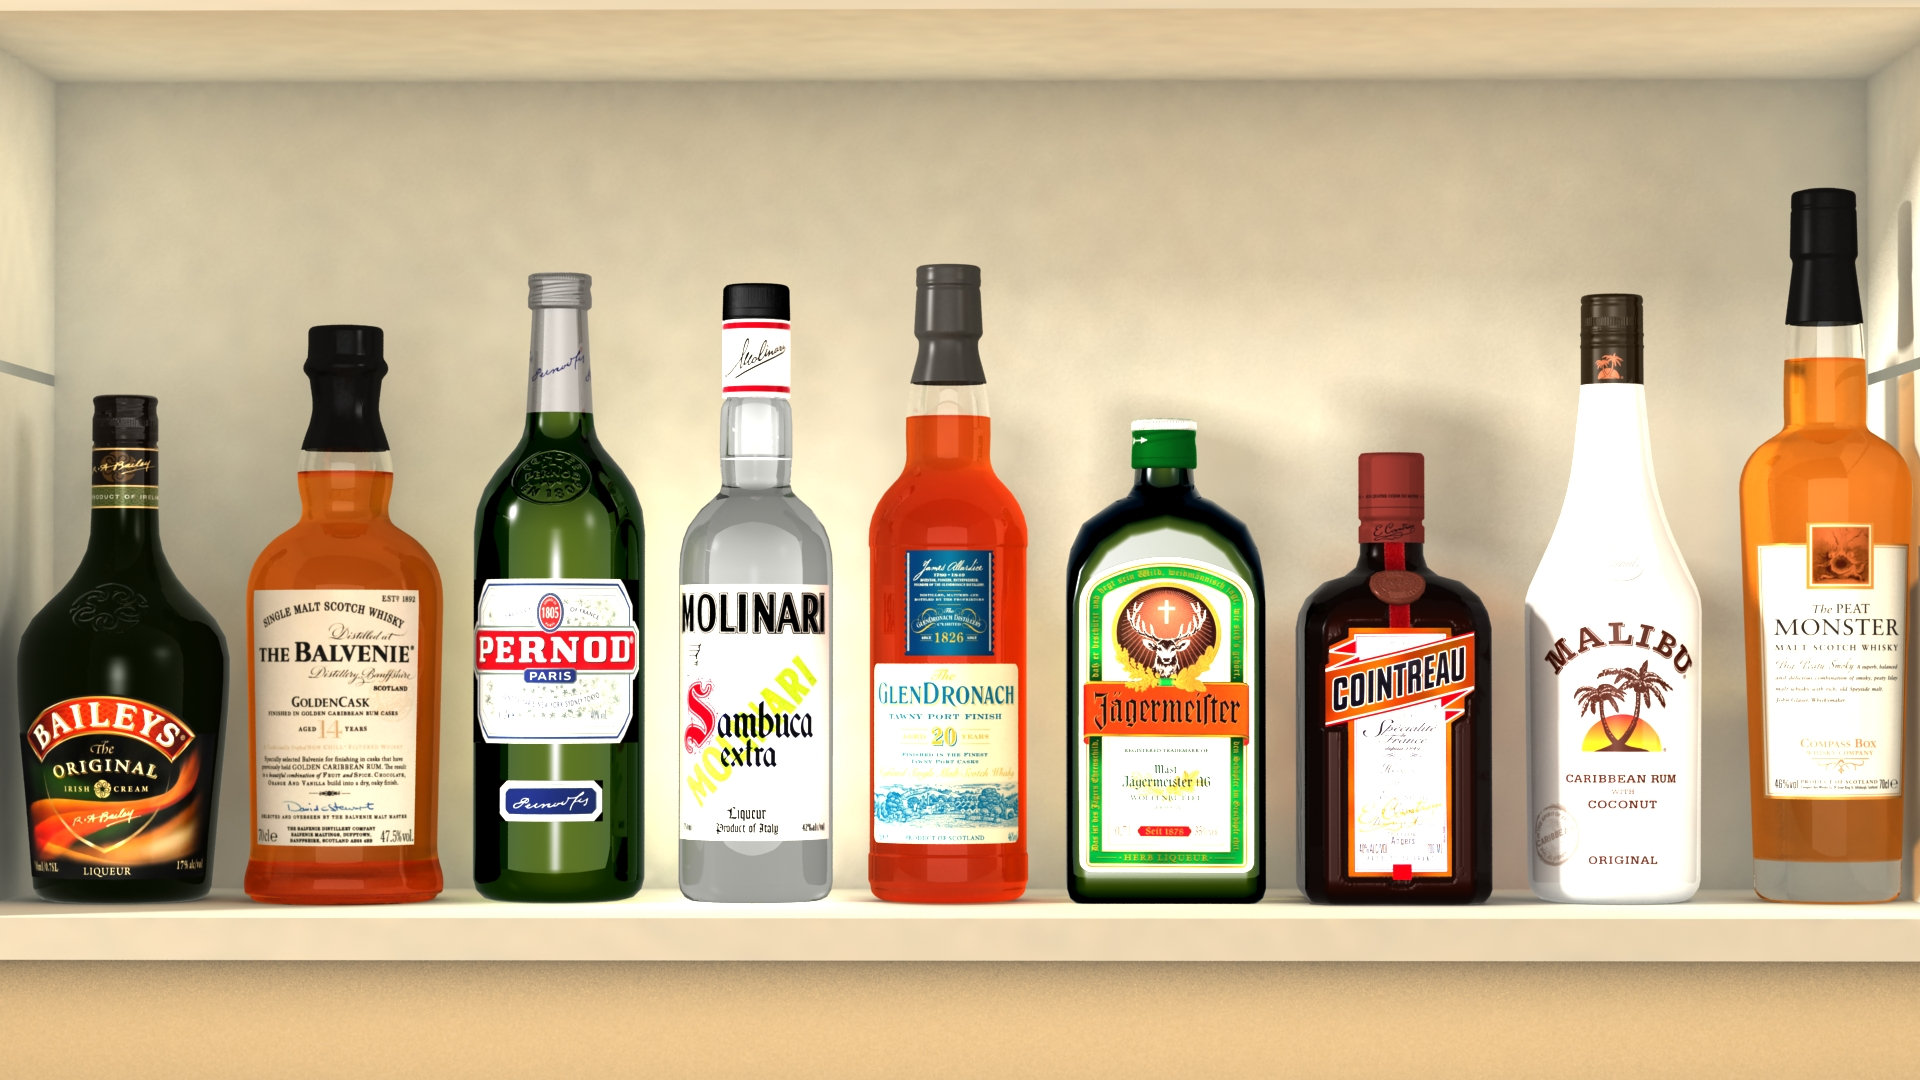 liquor bottles with bar unit interior vr/ar ready 3d model 3ds max  fbx jpeg jpg texture obj 279241